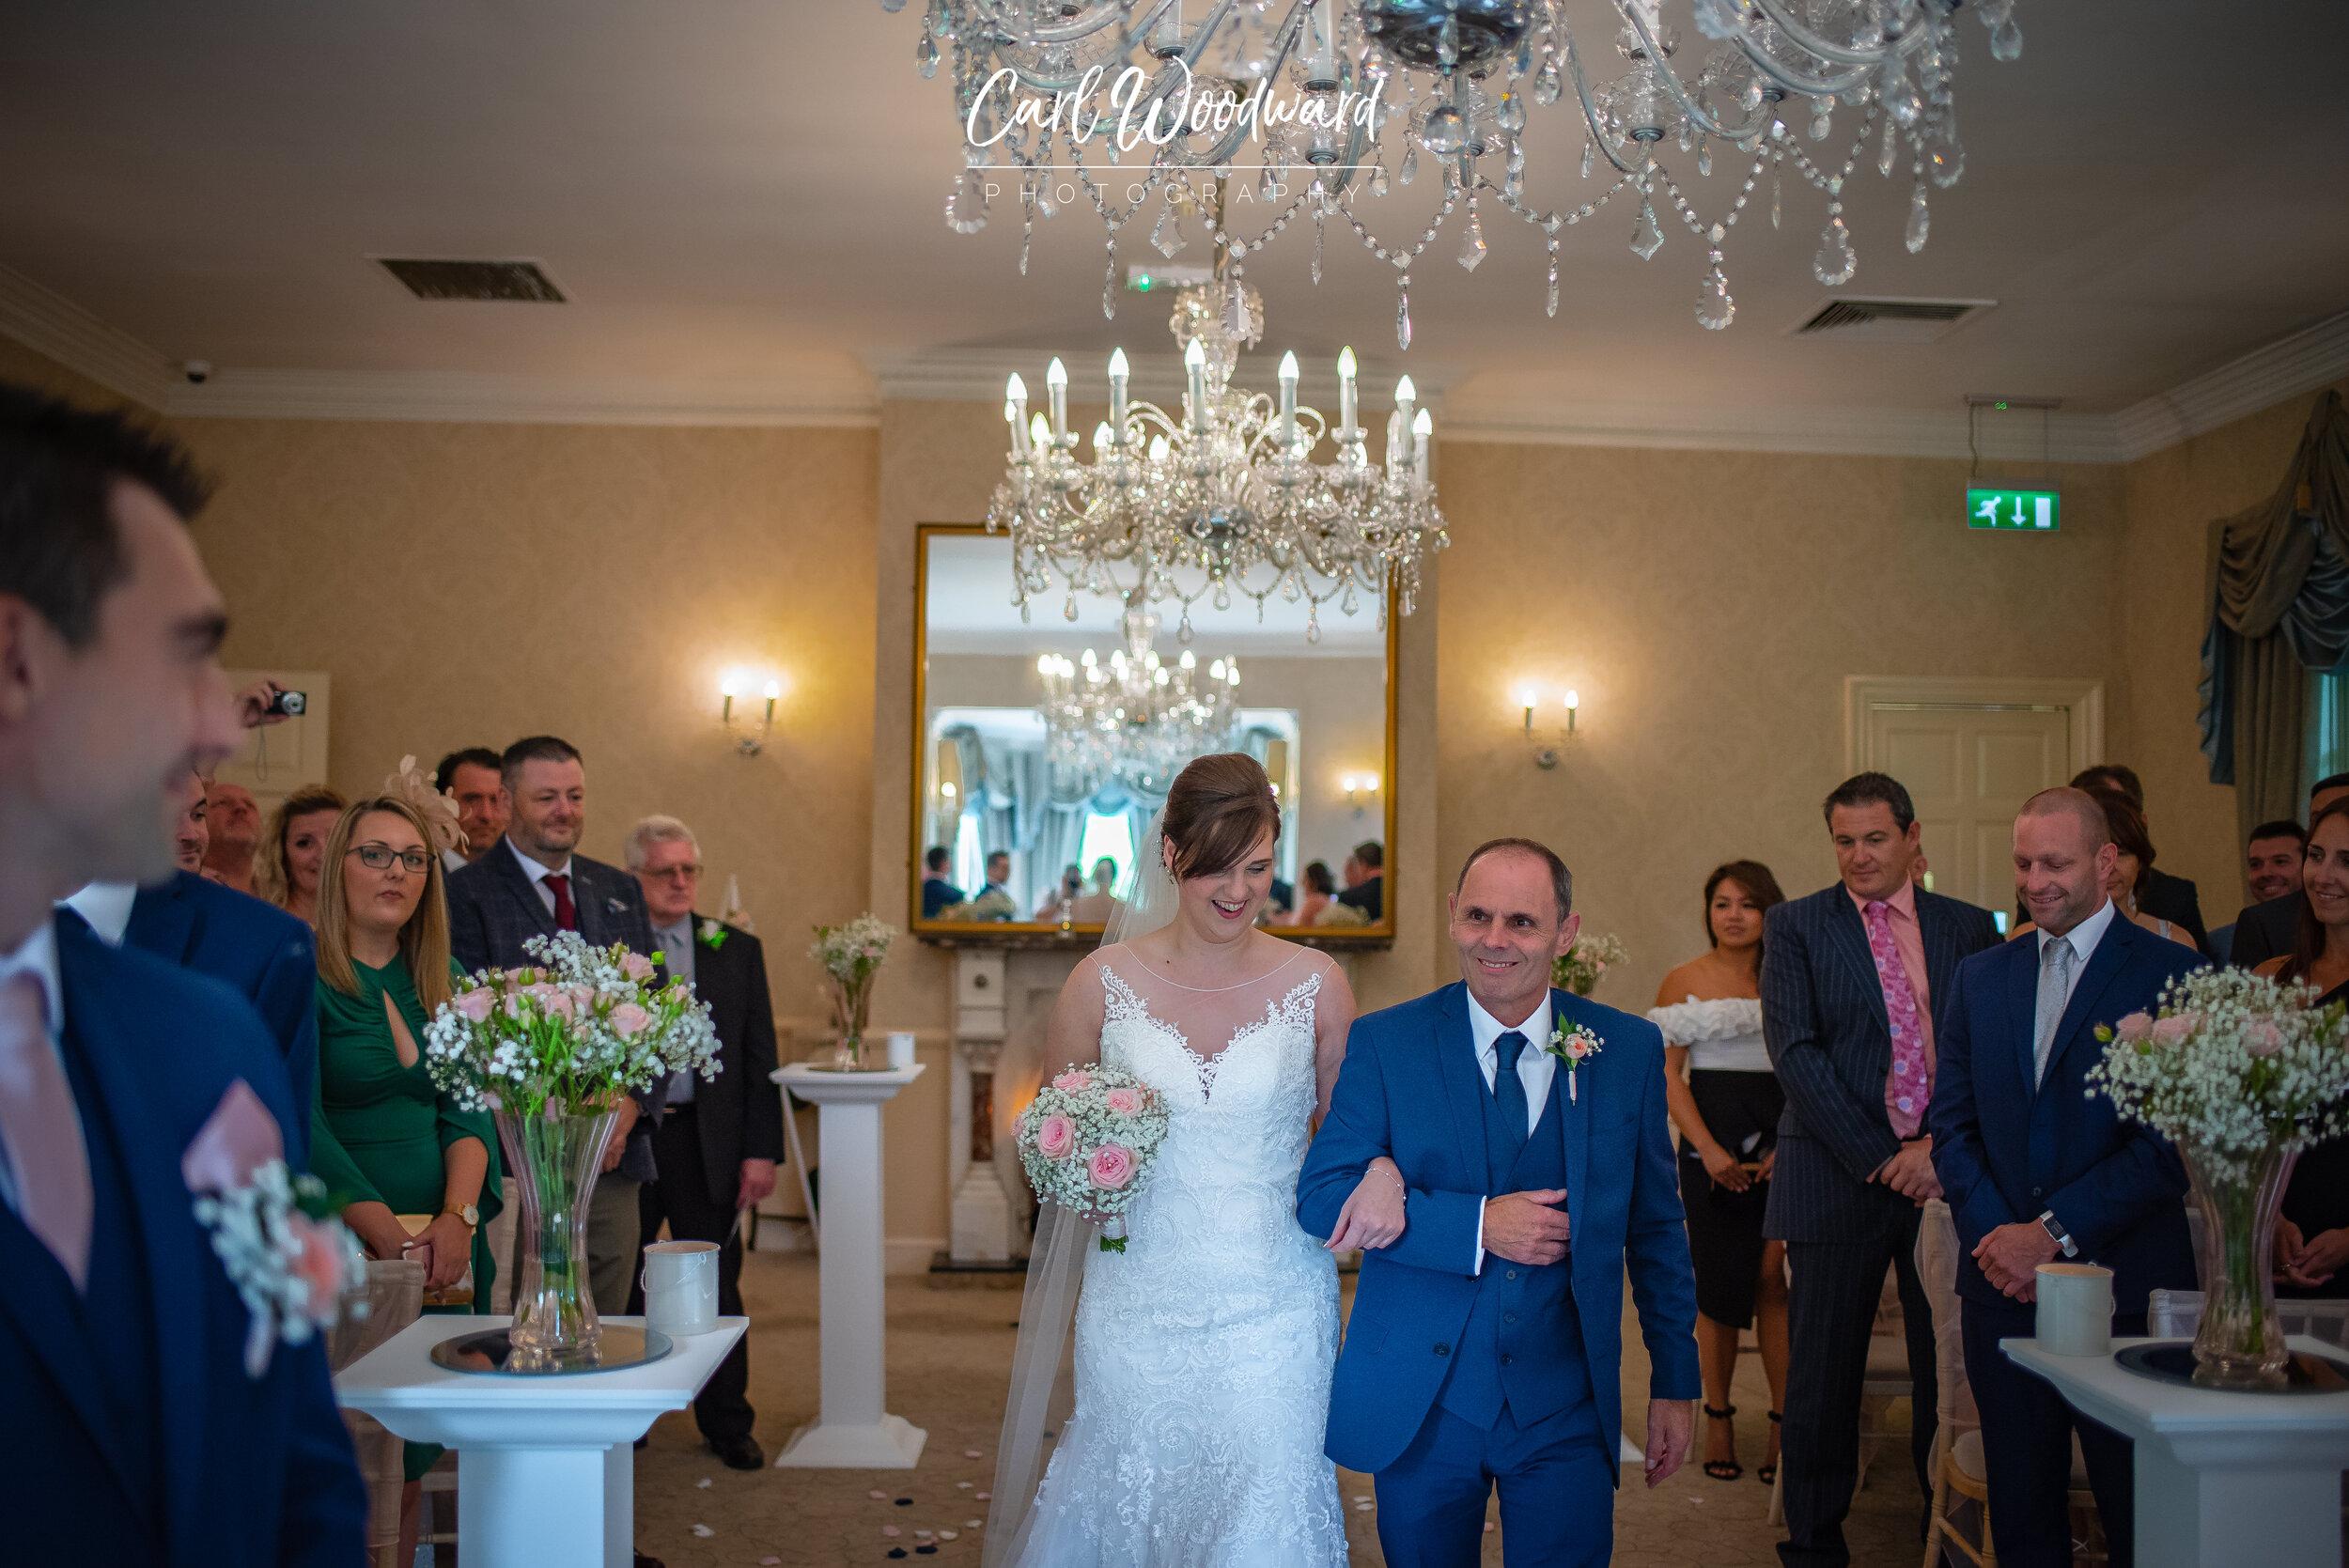 008-De-Courcesys-Manor-Weddings-Cardiff-Wedding-Photographer.jpg